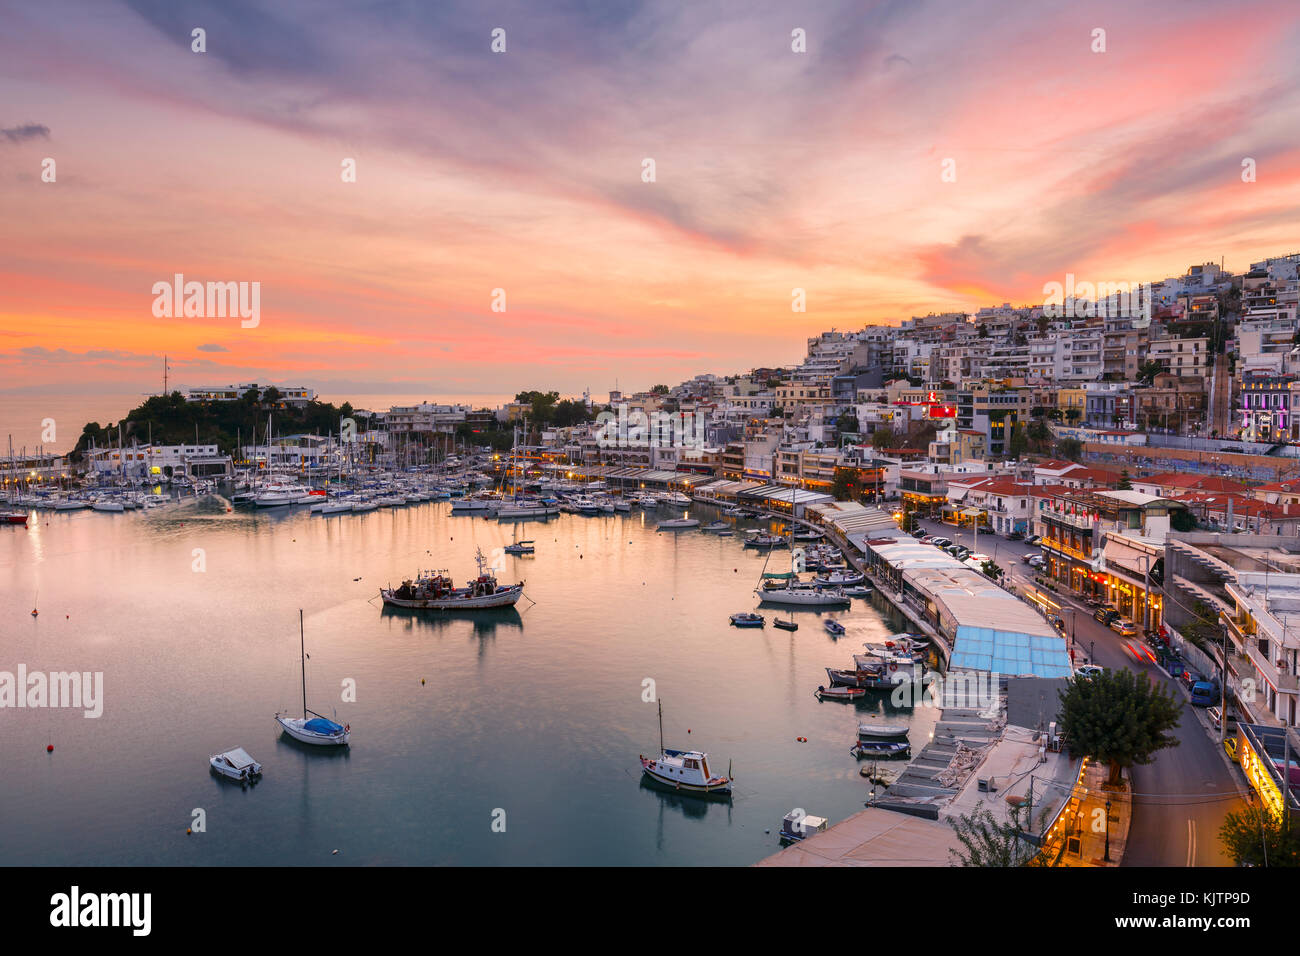 En soirée Mikrolimano marina à Athènes, Grèce. Photo Stock